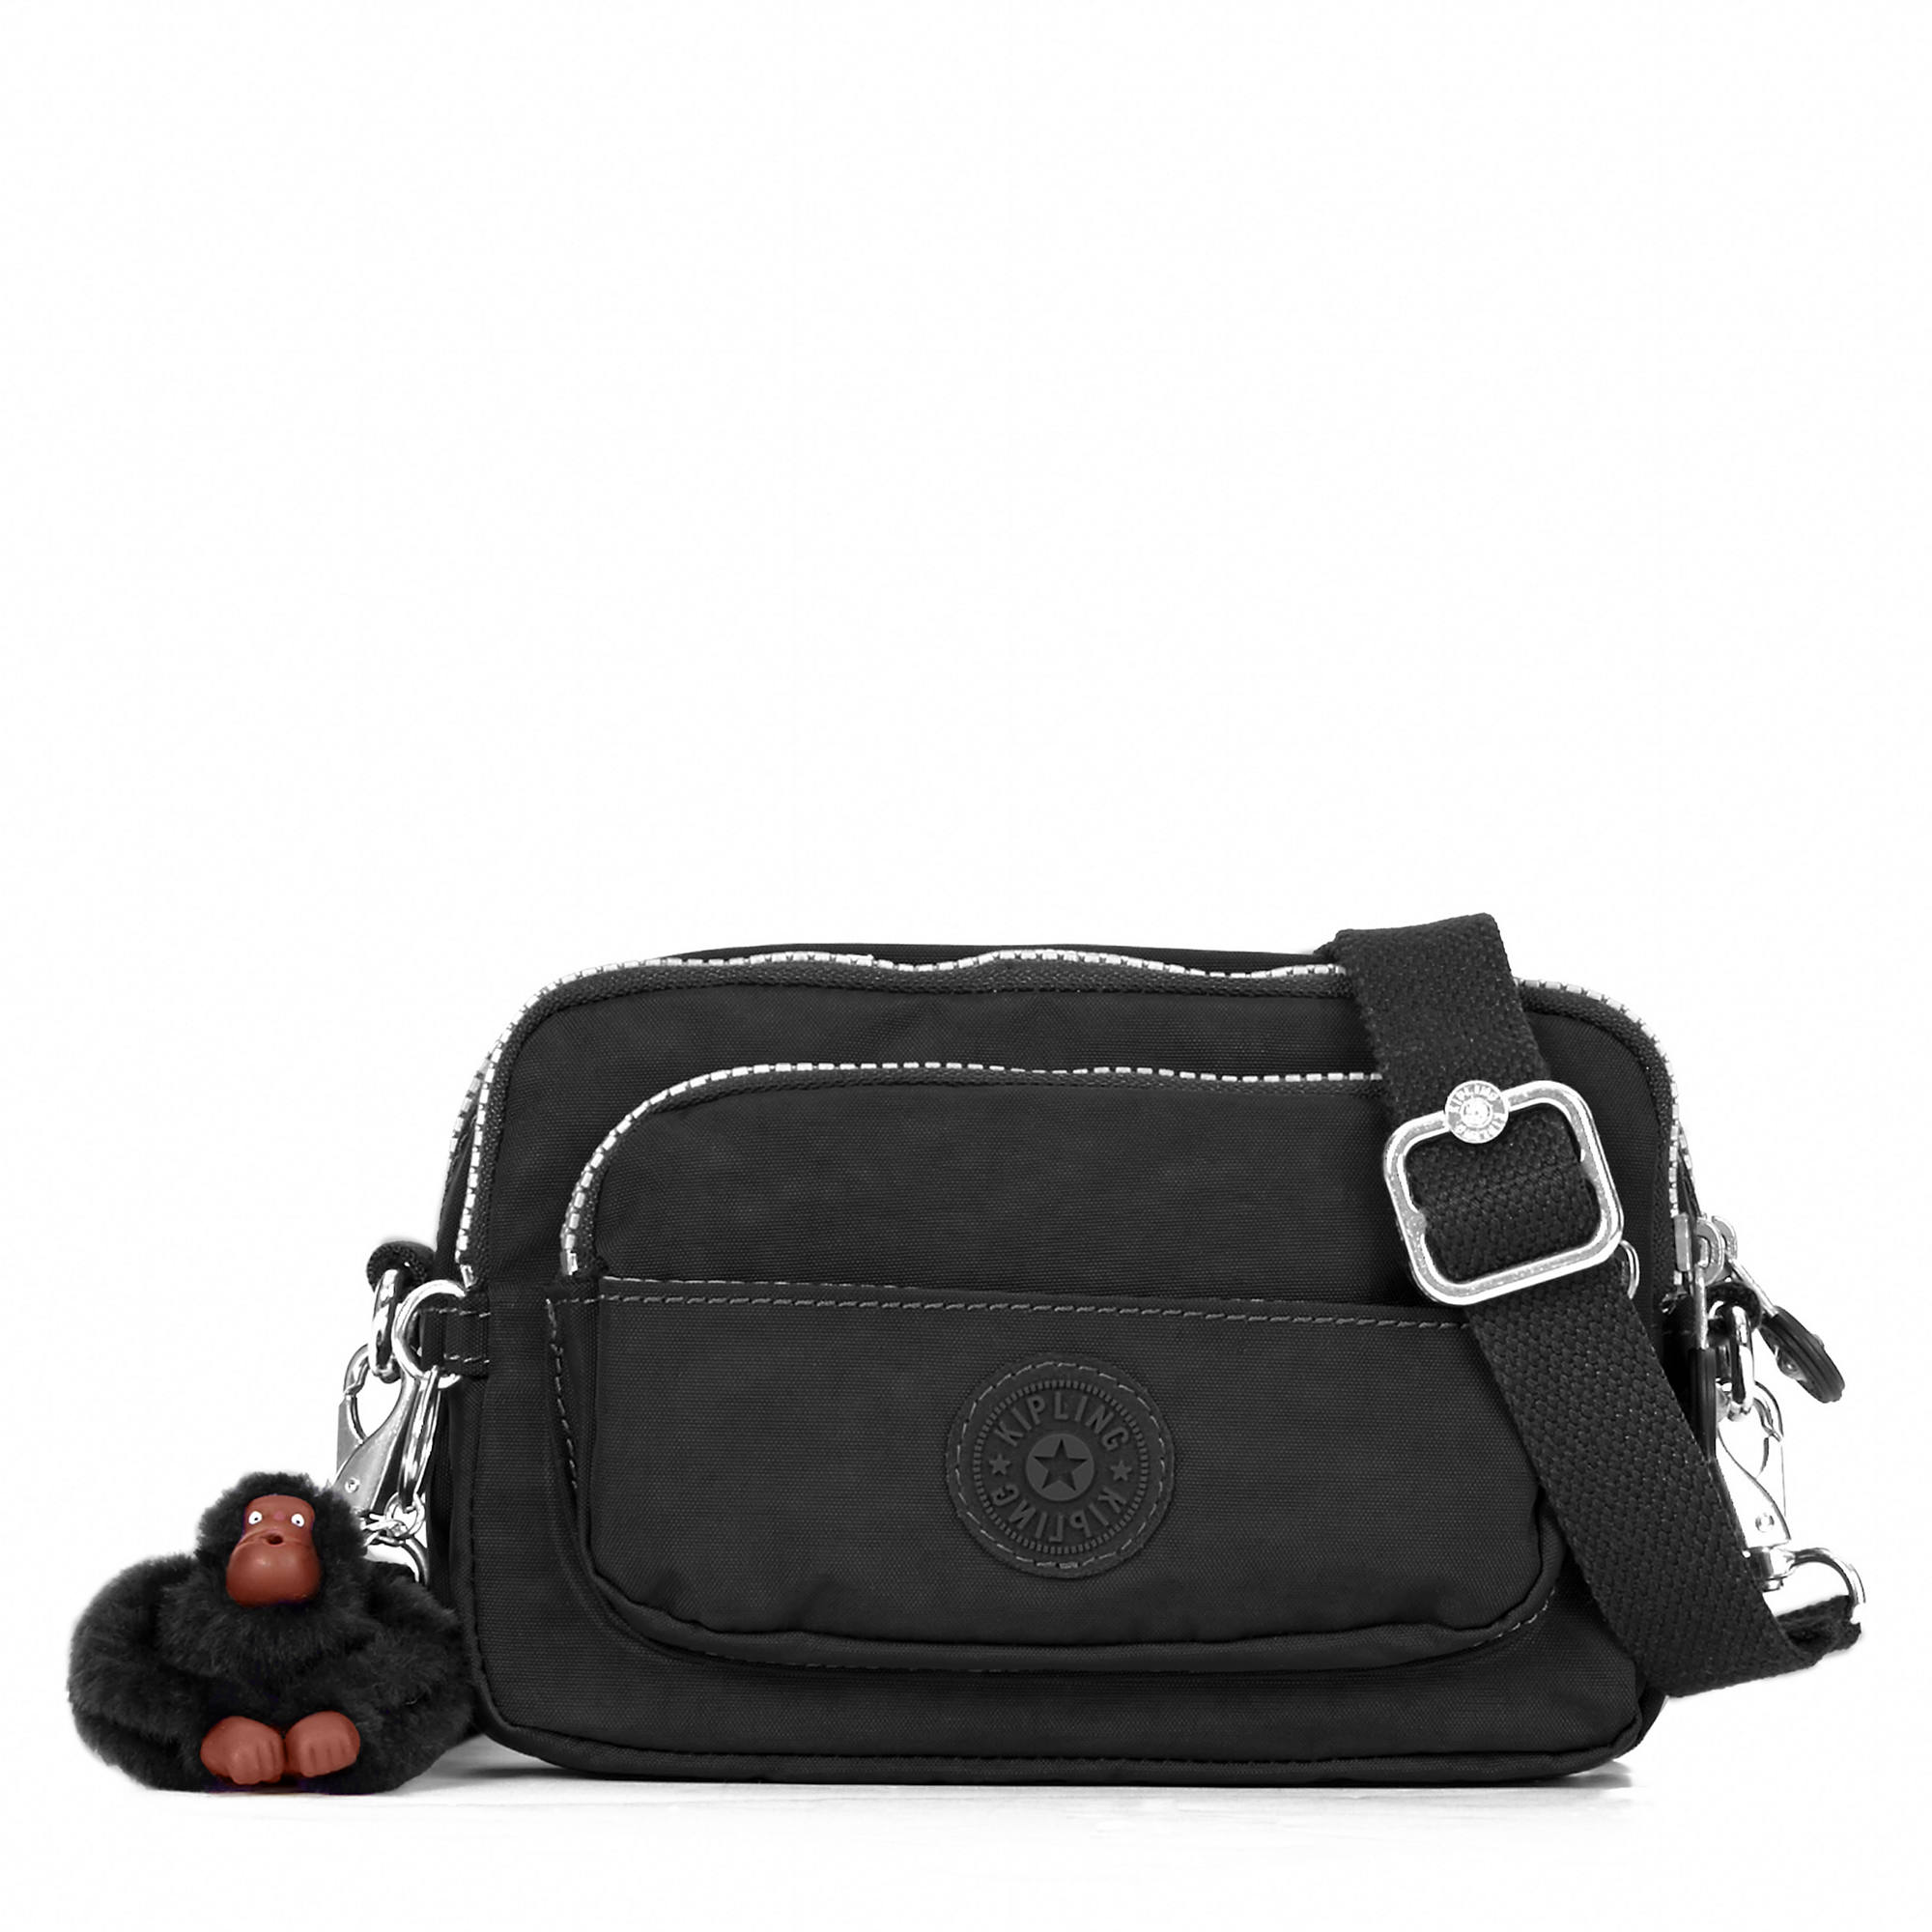 Merryl 2 In 1 Convertible Crossbody Bag